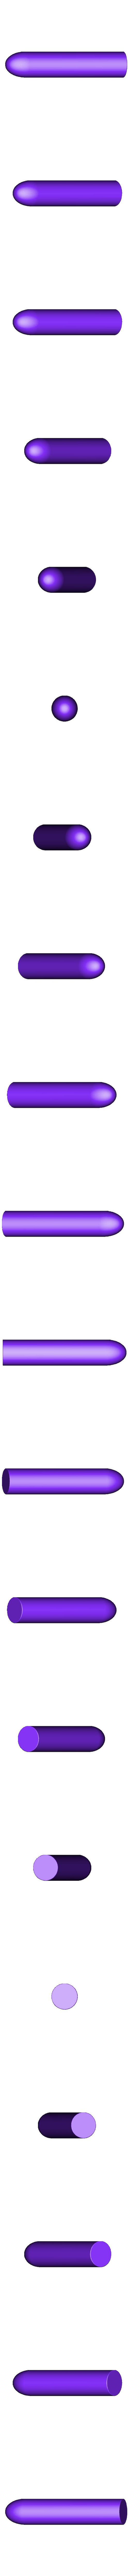 Star Wars VII The Force Awakens Kylo Ren Sword Cosplay Weapon Prop - Lightless_stl_Äåòàëü2_2.stl Download OBJ file Star Wars VII The Force Awakens Kylo Ren Sword Cosplay Prop • 3D printer object, Blackeveryday